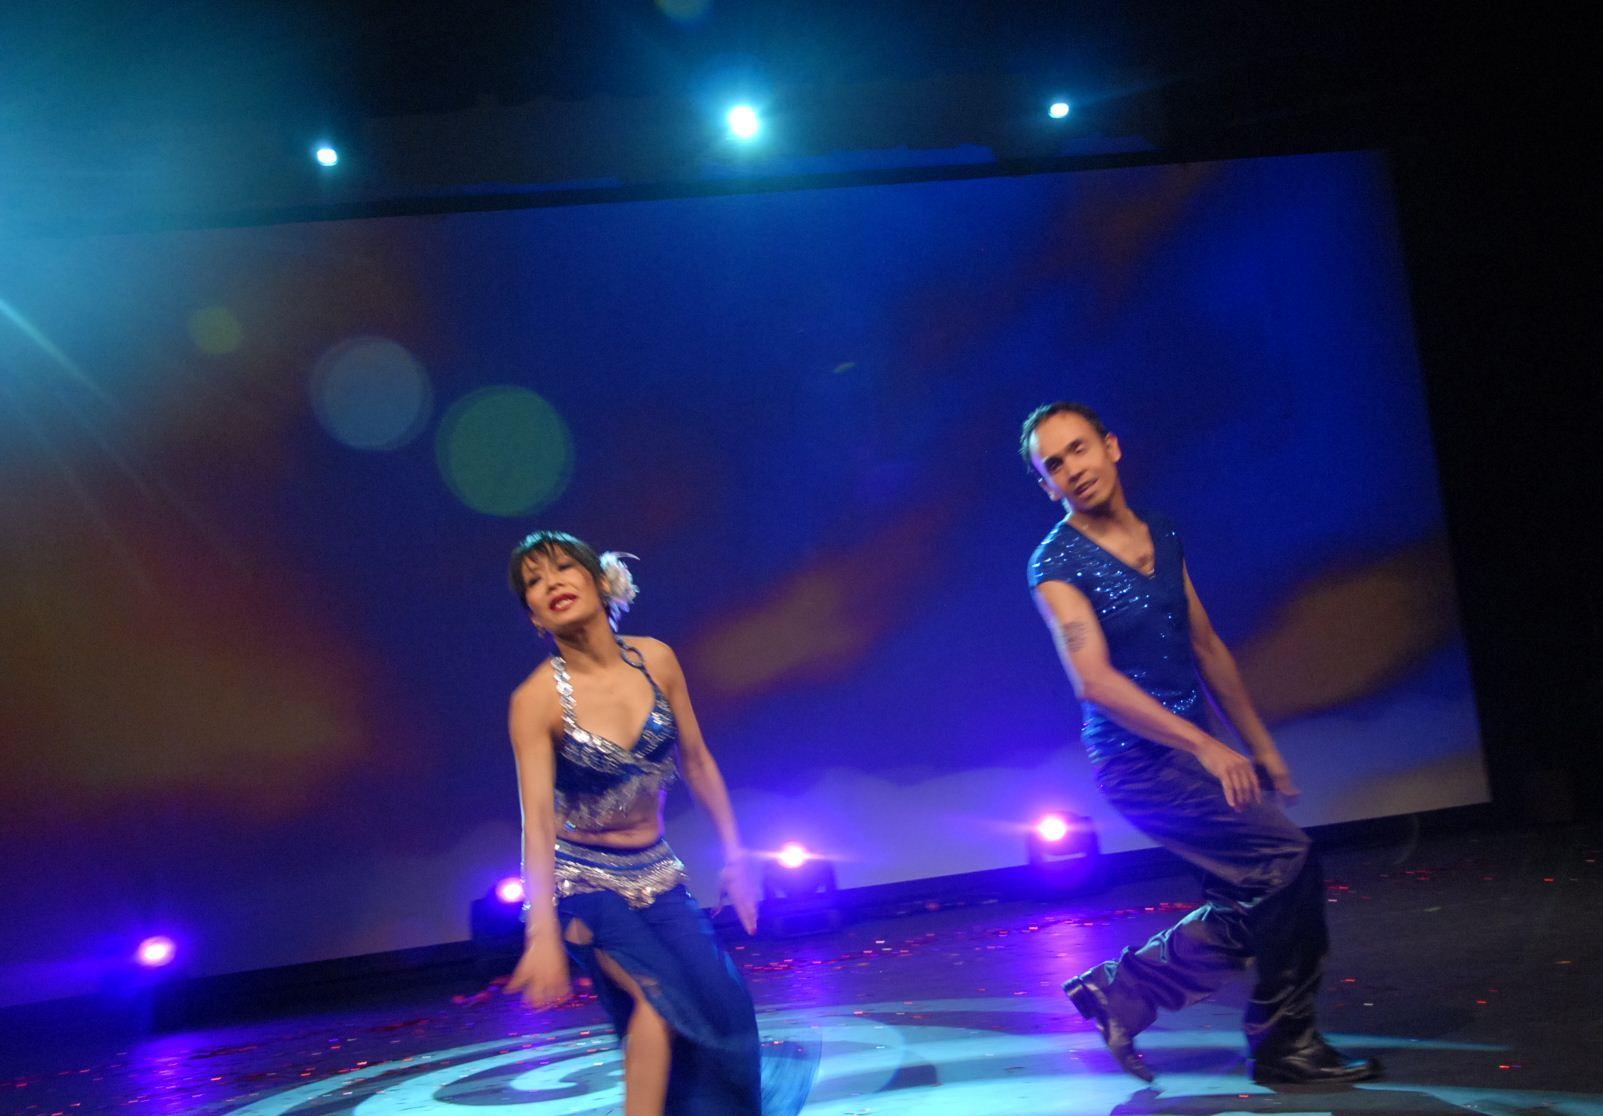 NAVIN KC - dance with luna 2